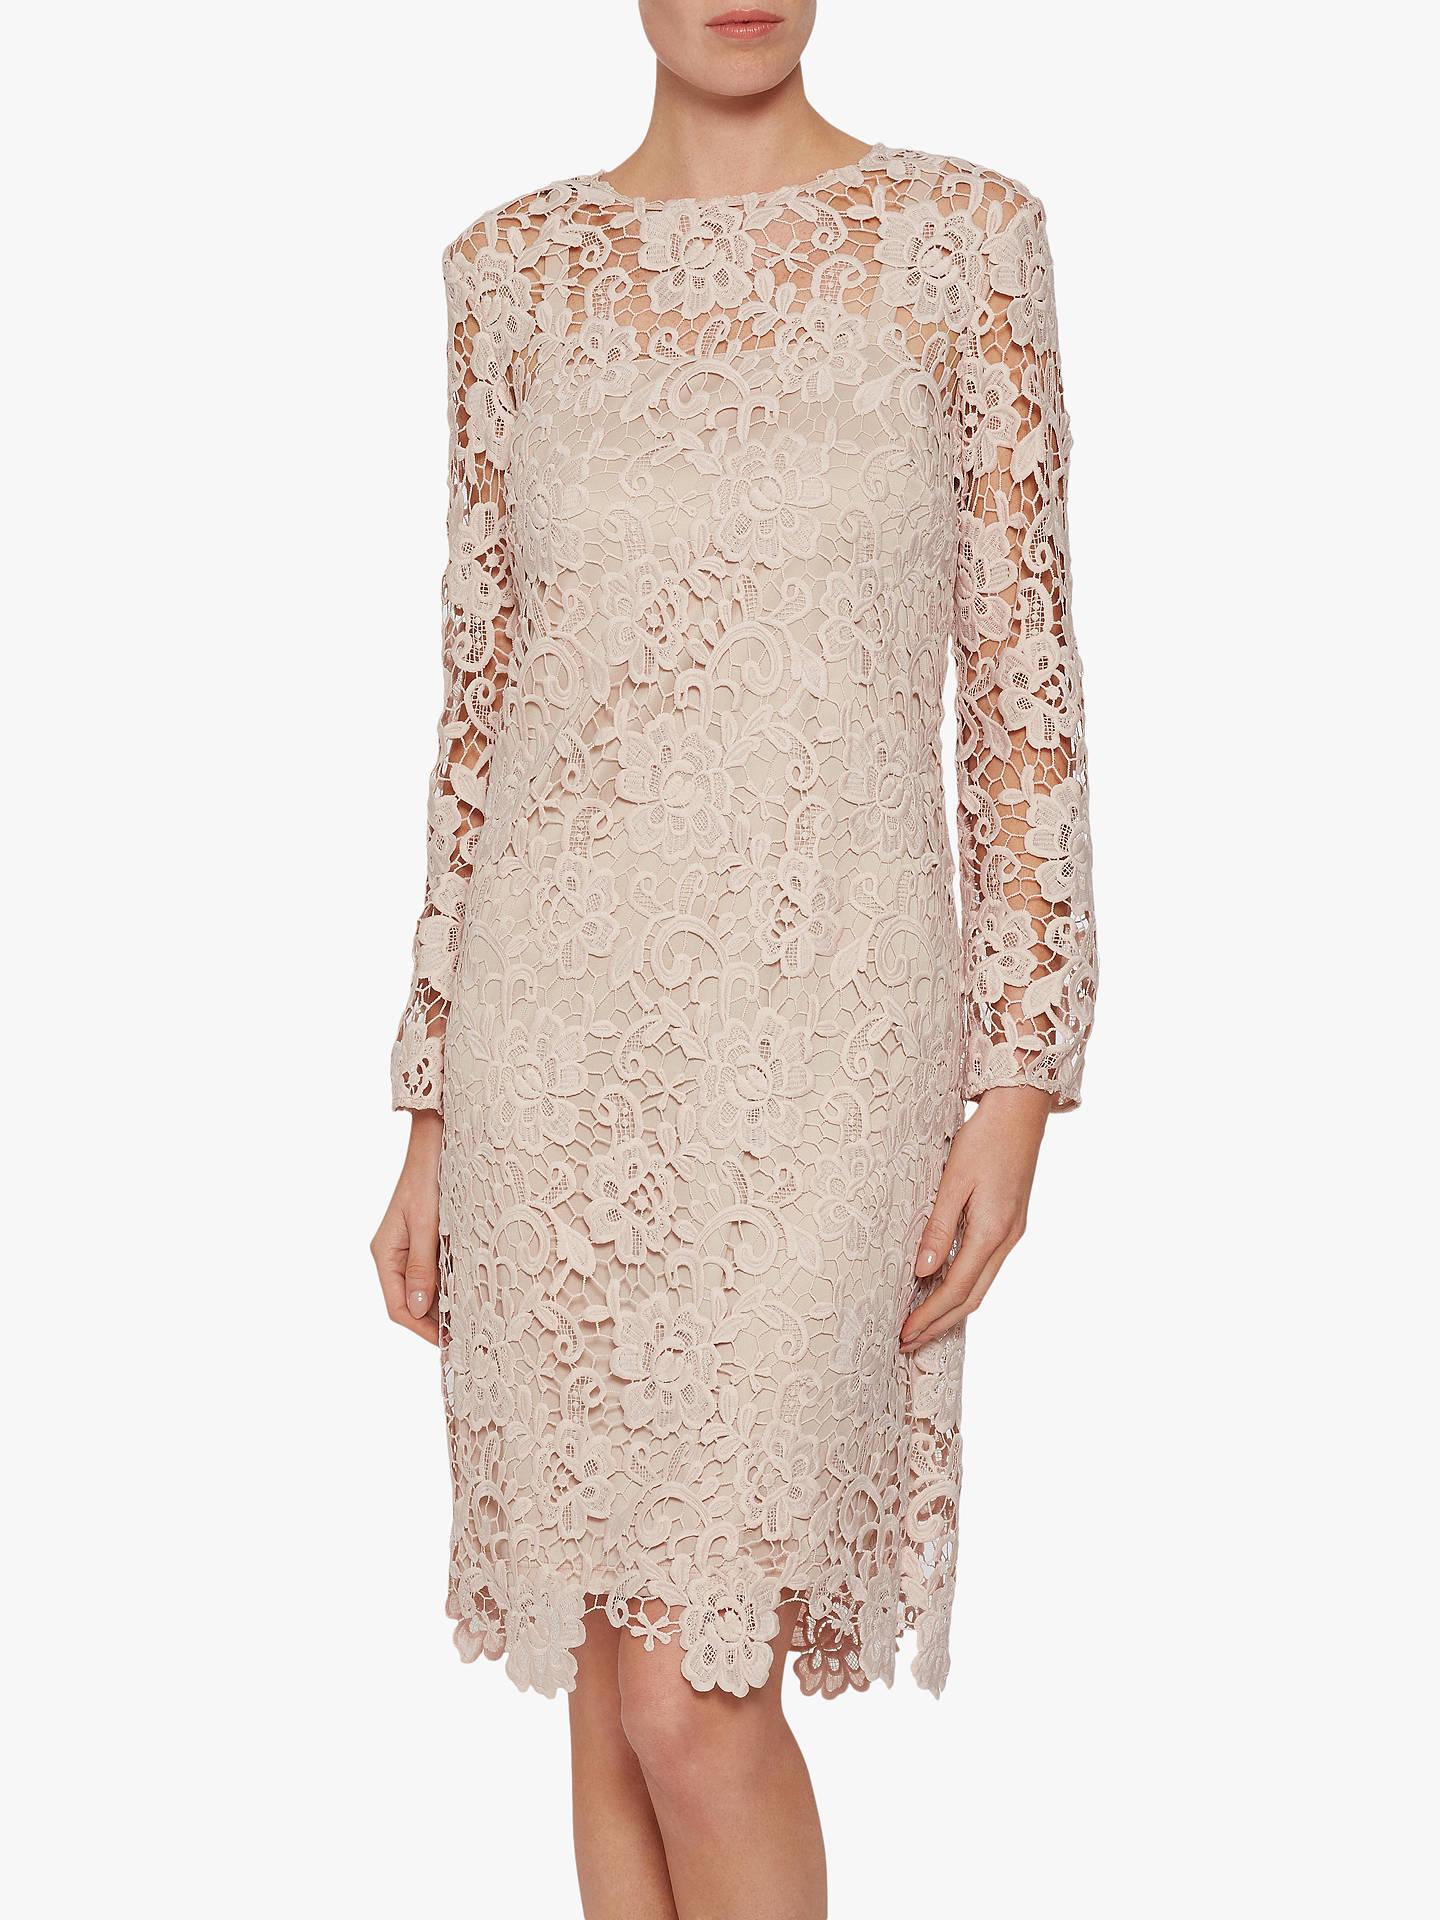 832edc55cb Buy Gina Bacconi Lorenza Lace Maxi Dress, Antique Rose, 8 Online at  johnlewis.